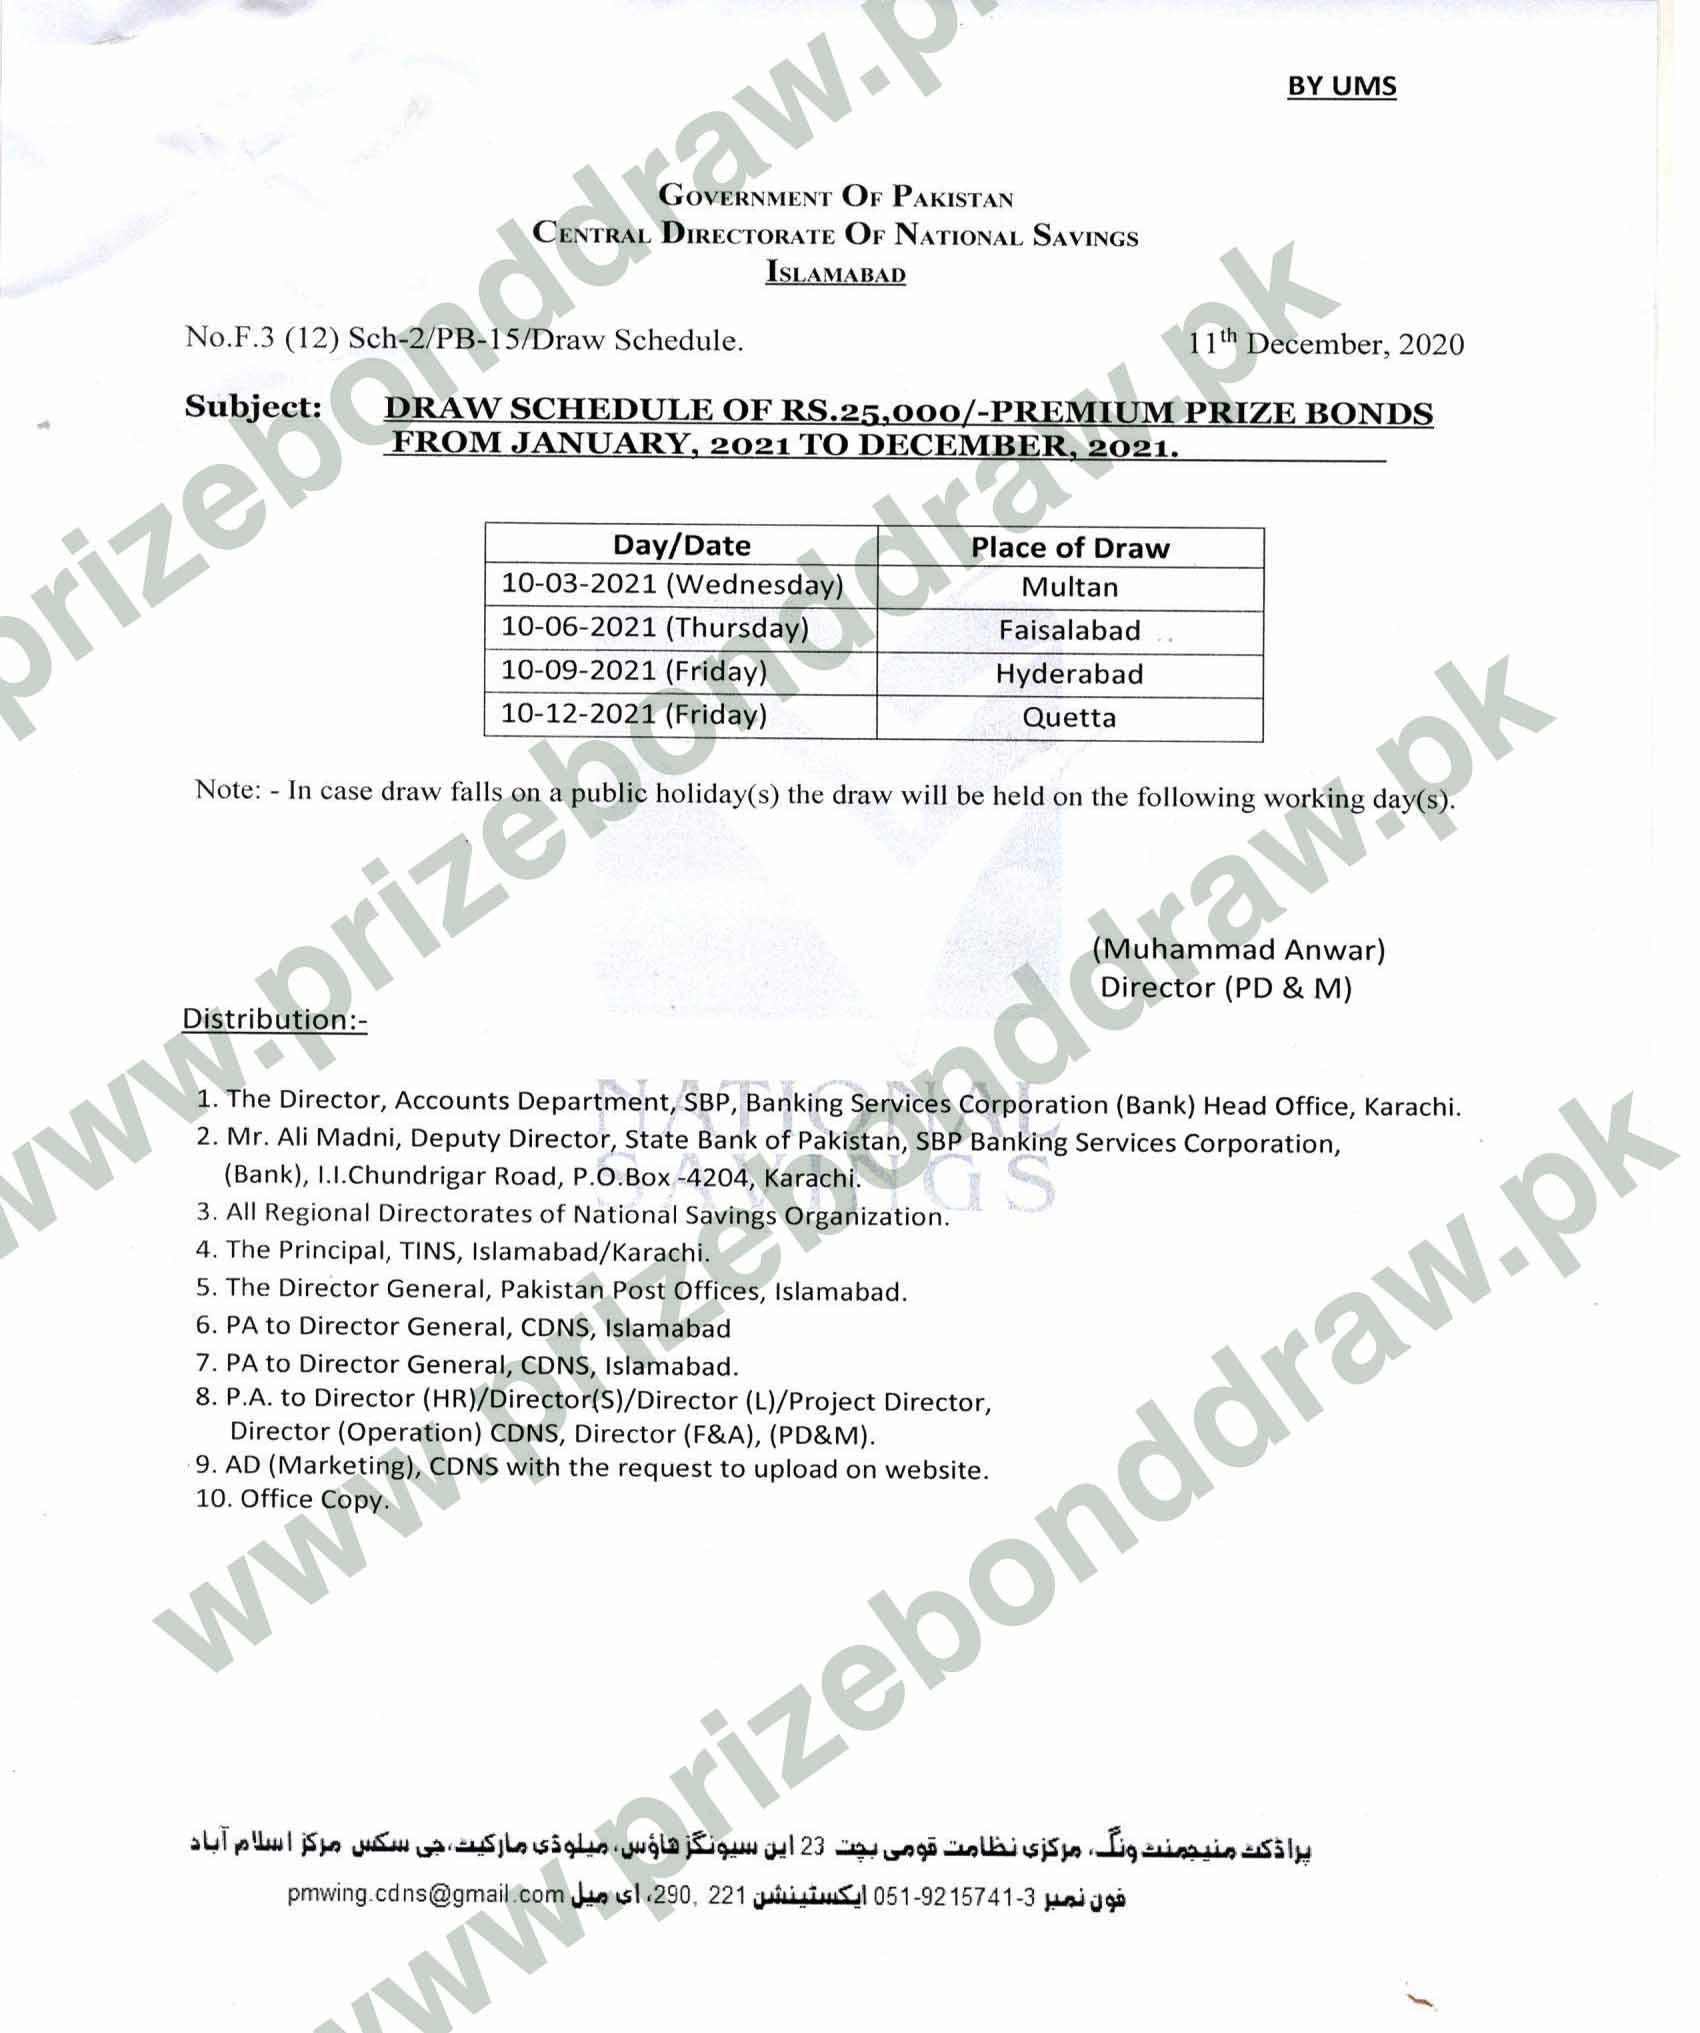 Rs. 25000 Premium Prize bond Schedule 2021